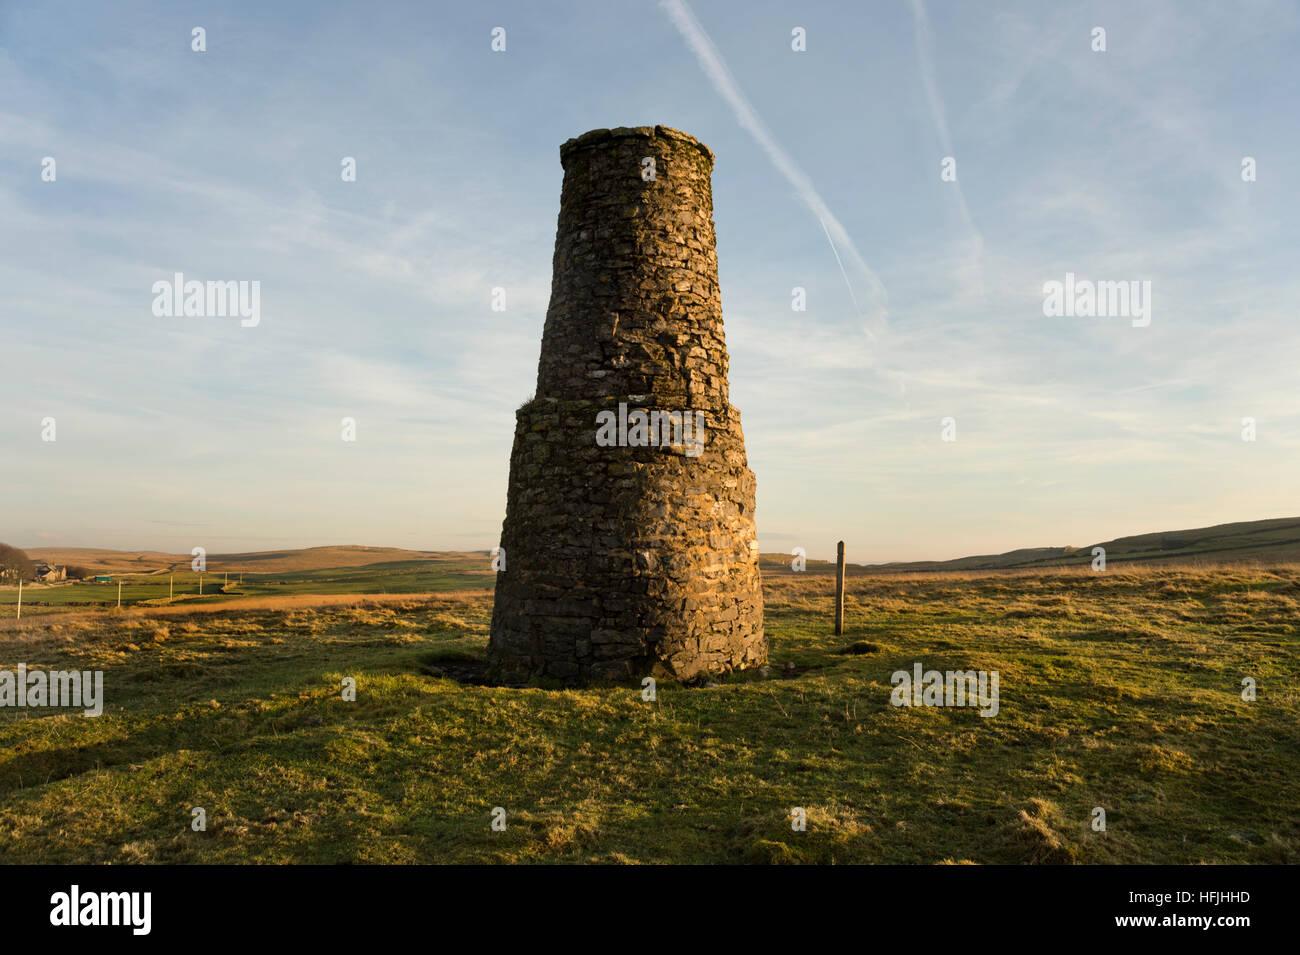 Old lead mine smelt chimney, Malham Moor, Yorkshire Dales National Park, UK - Stock Image